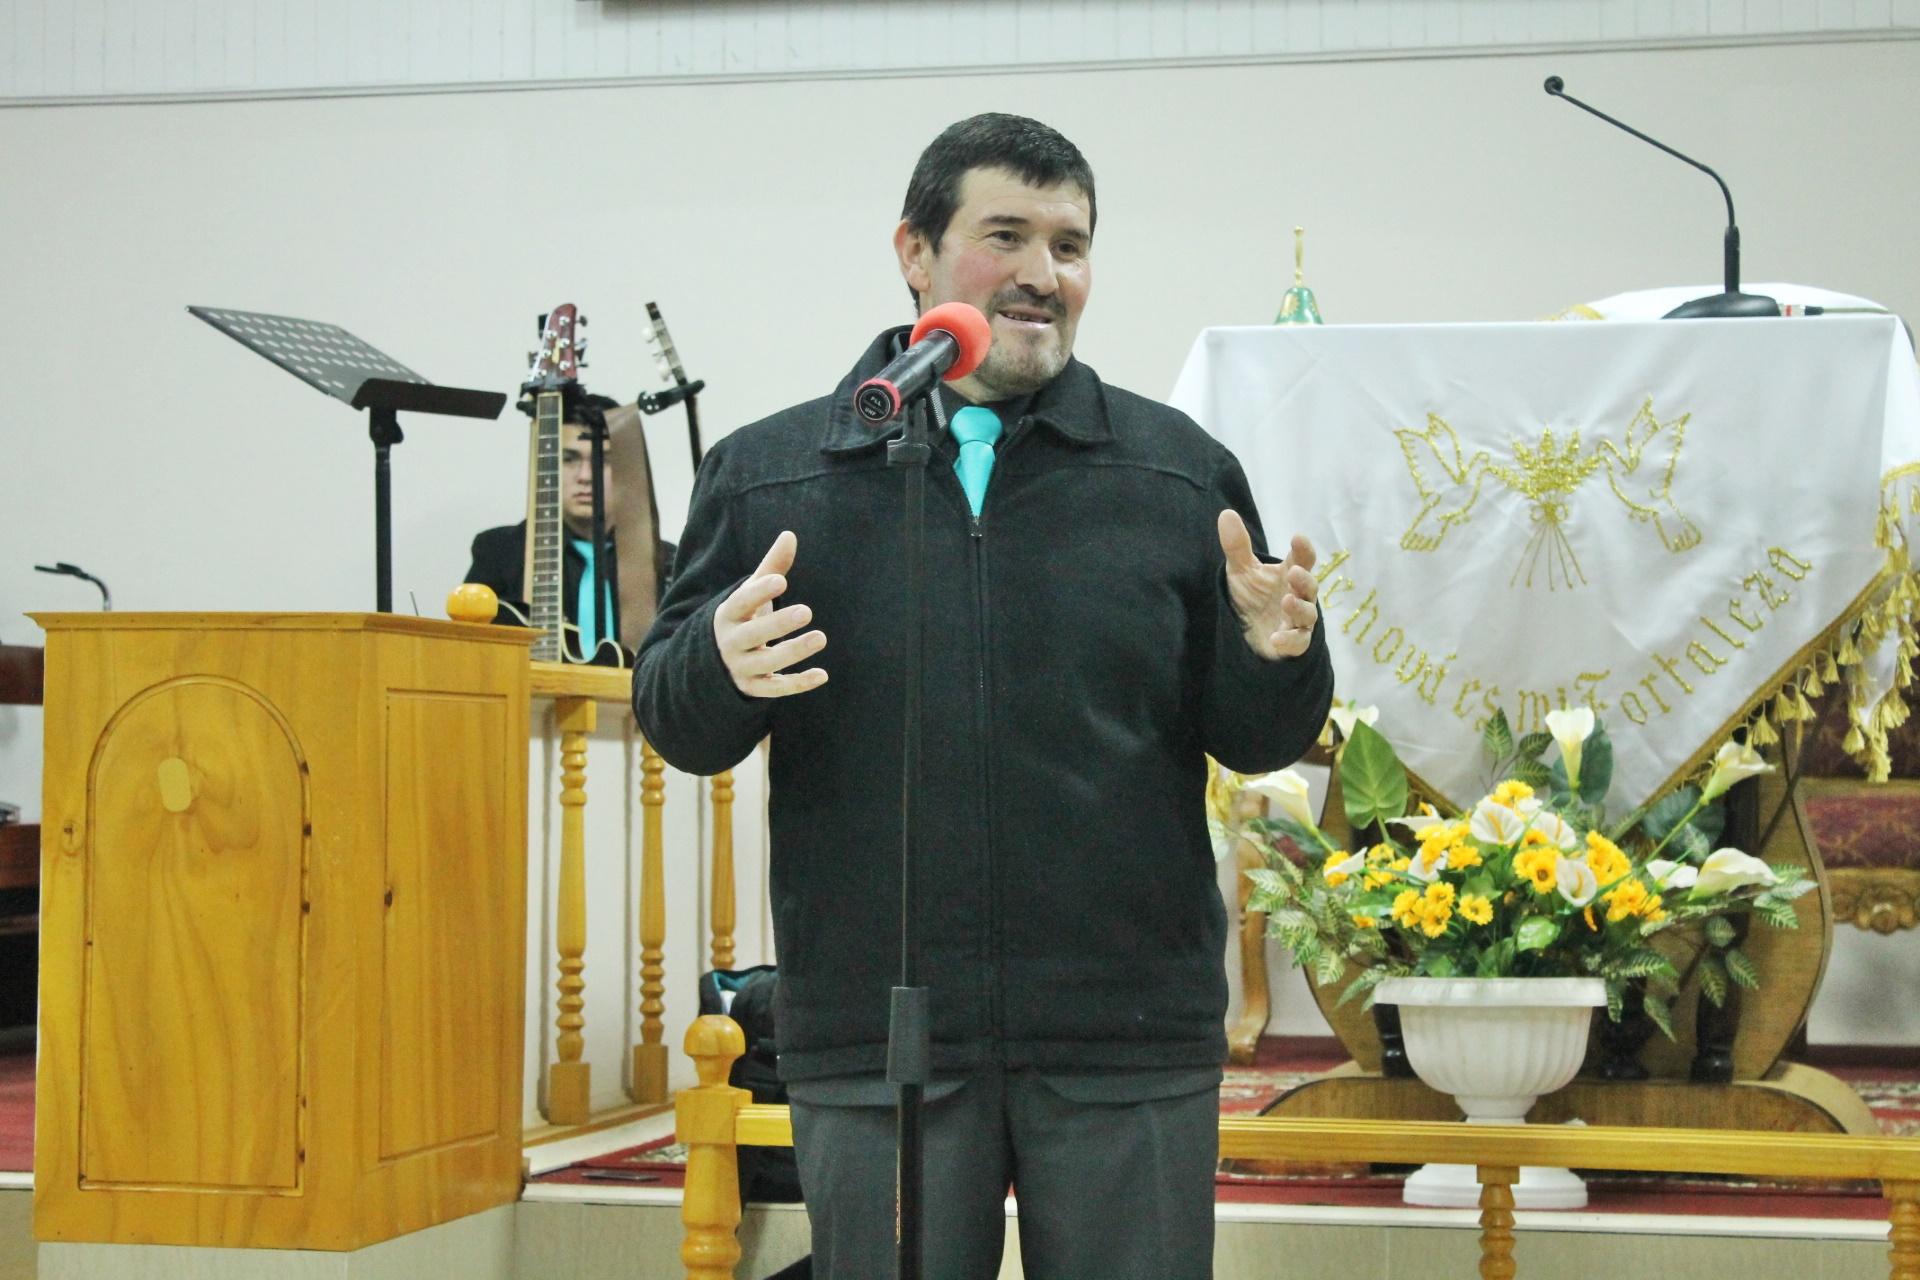 Uno en Cristo, Visita a Ranguelmo